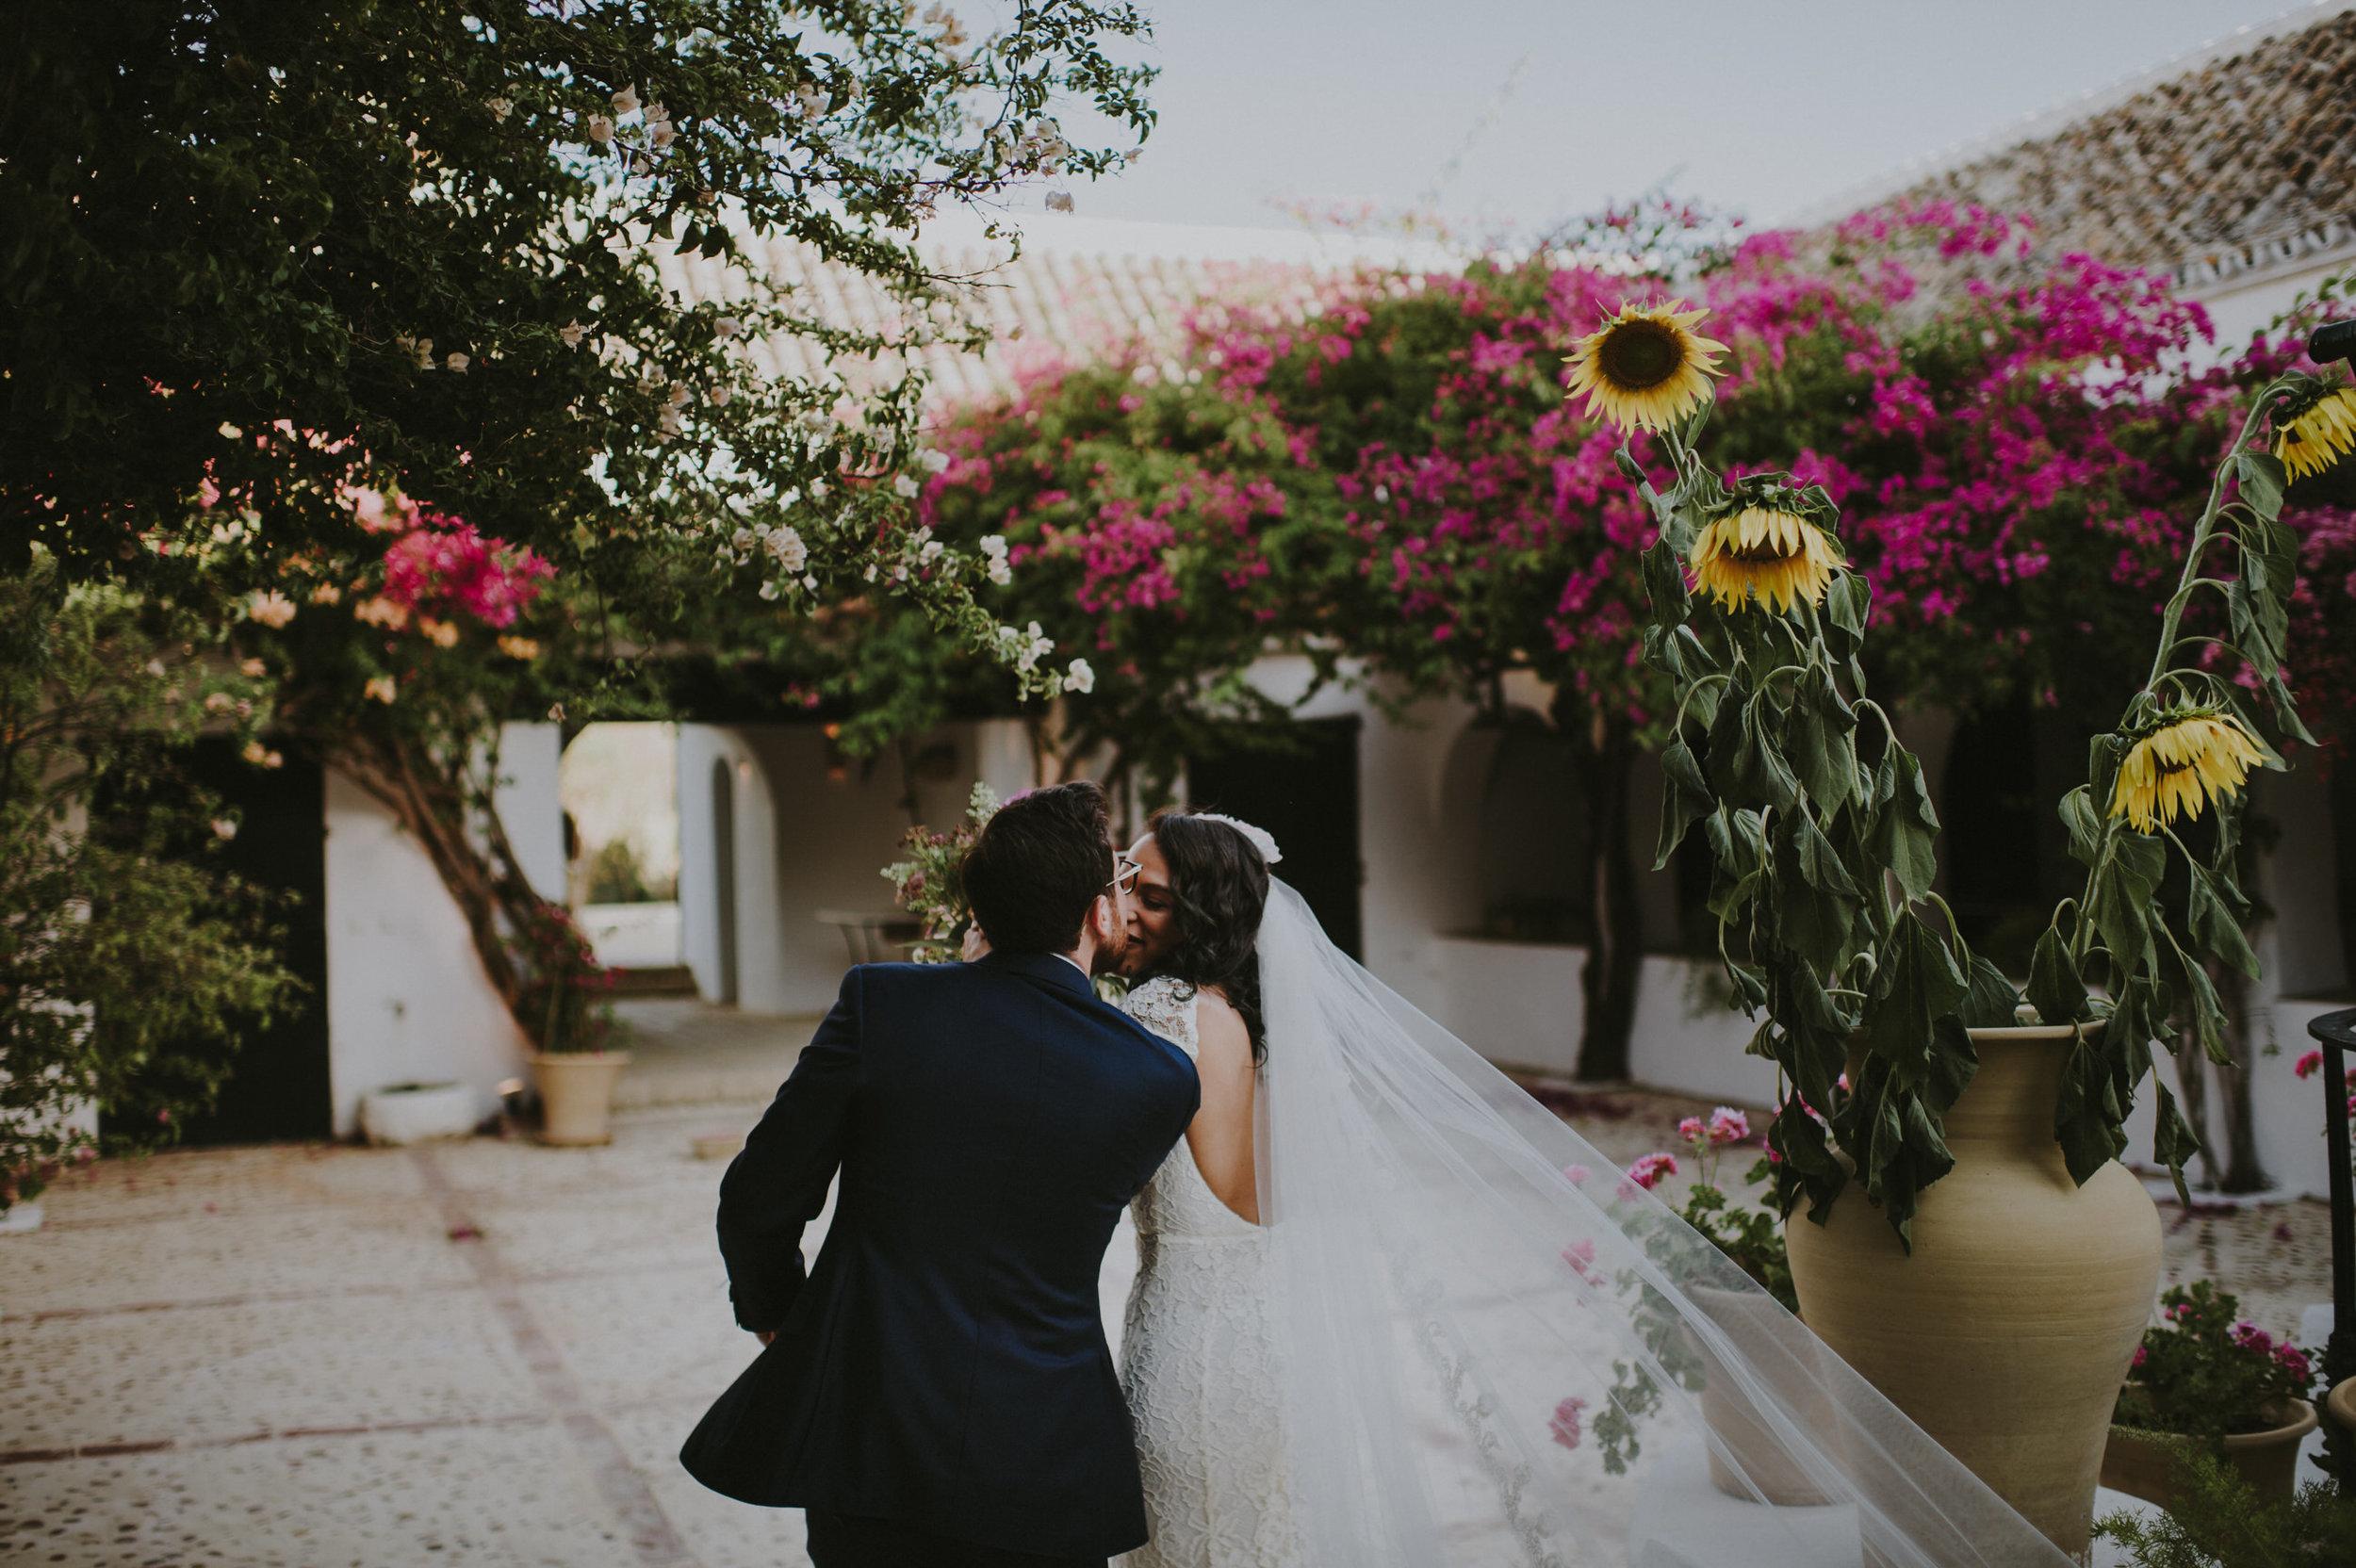 Andres+Amarillo+fotografo+boda+sevilla+natural+sin+poses+hacienda+san+rafael (66).JPG